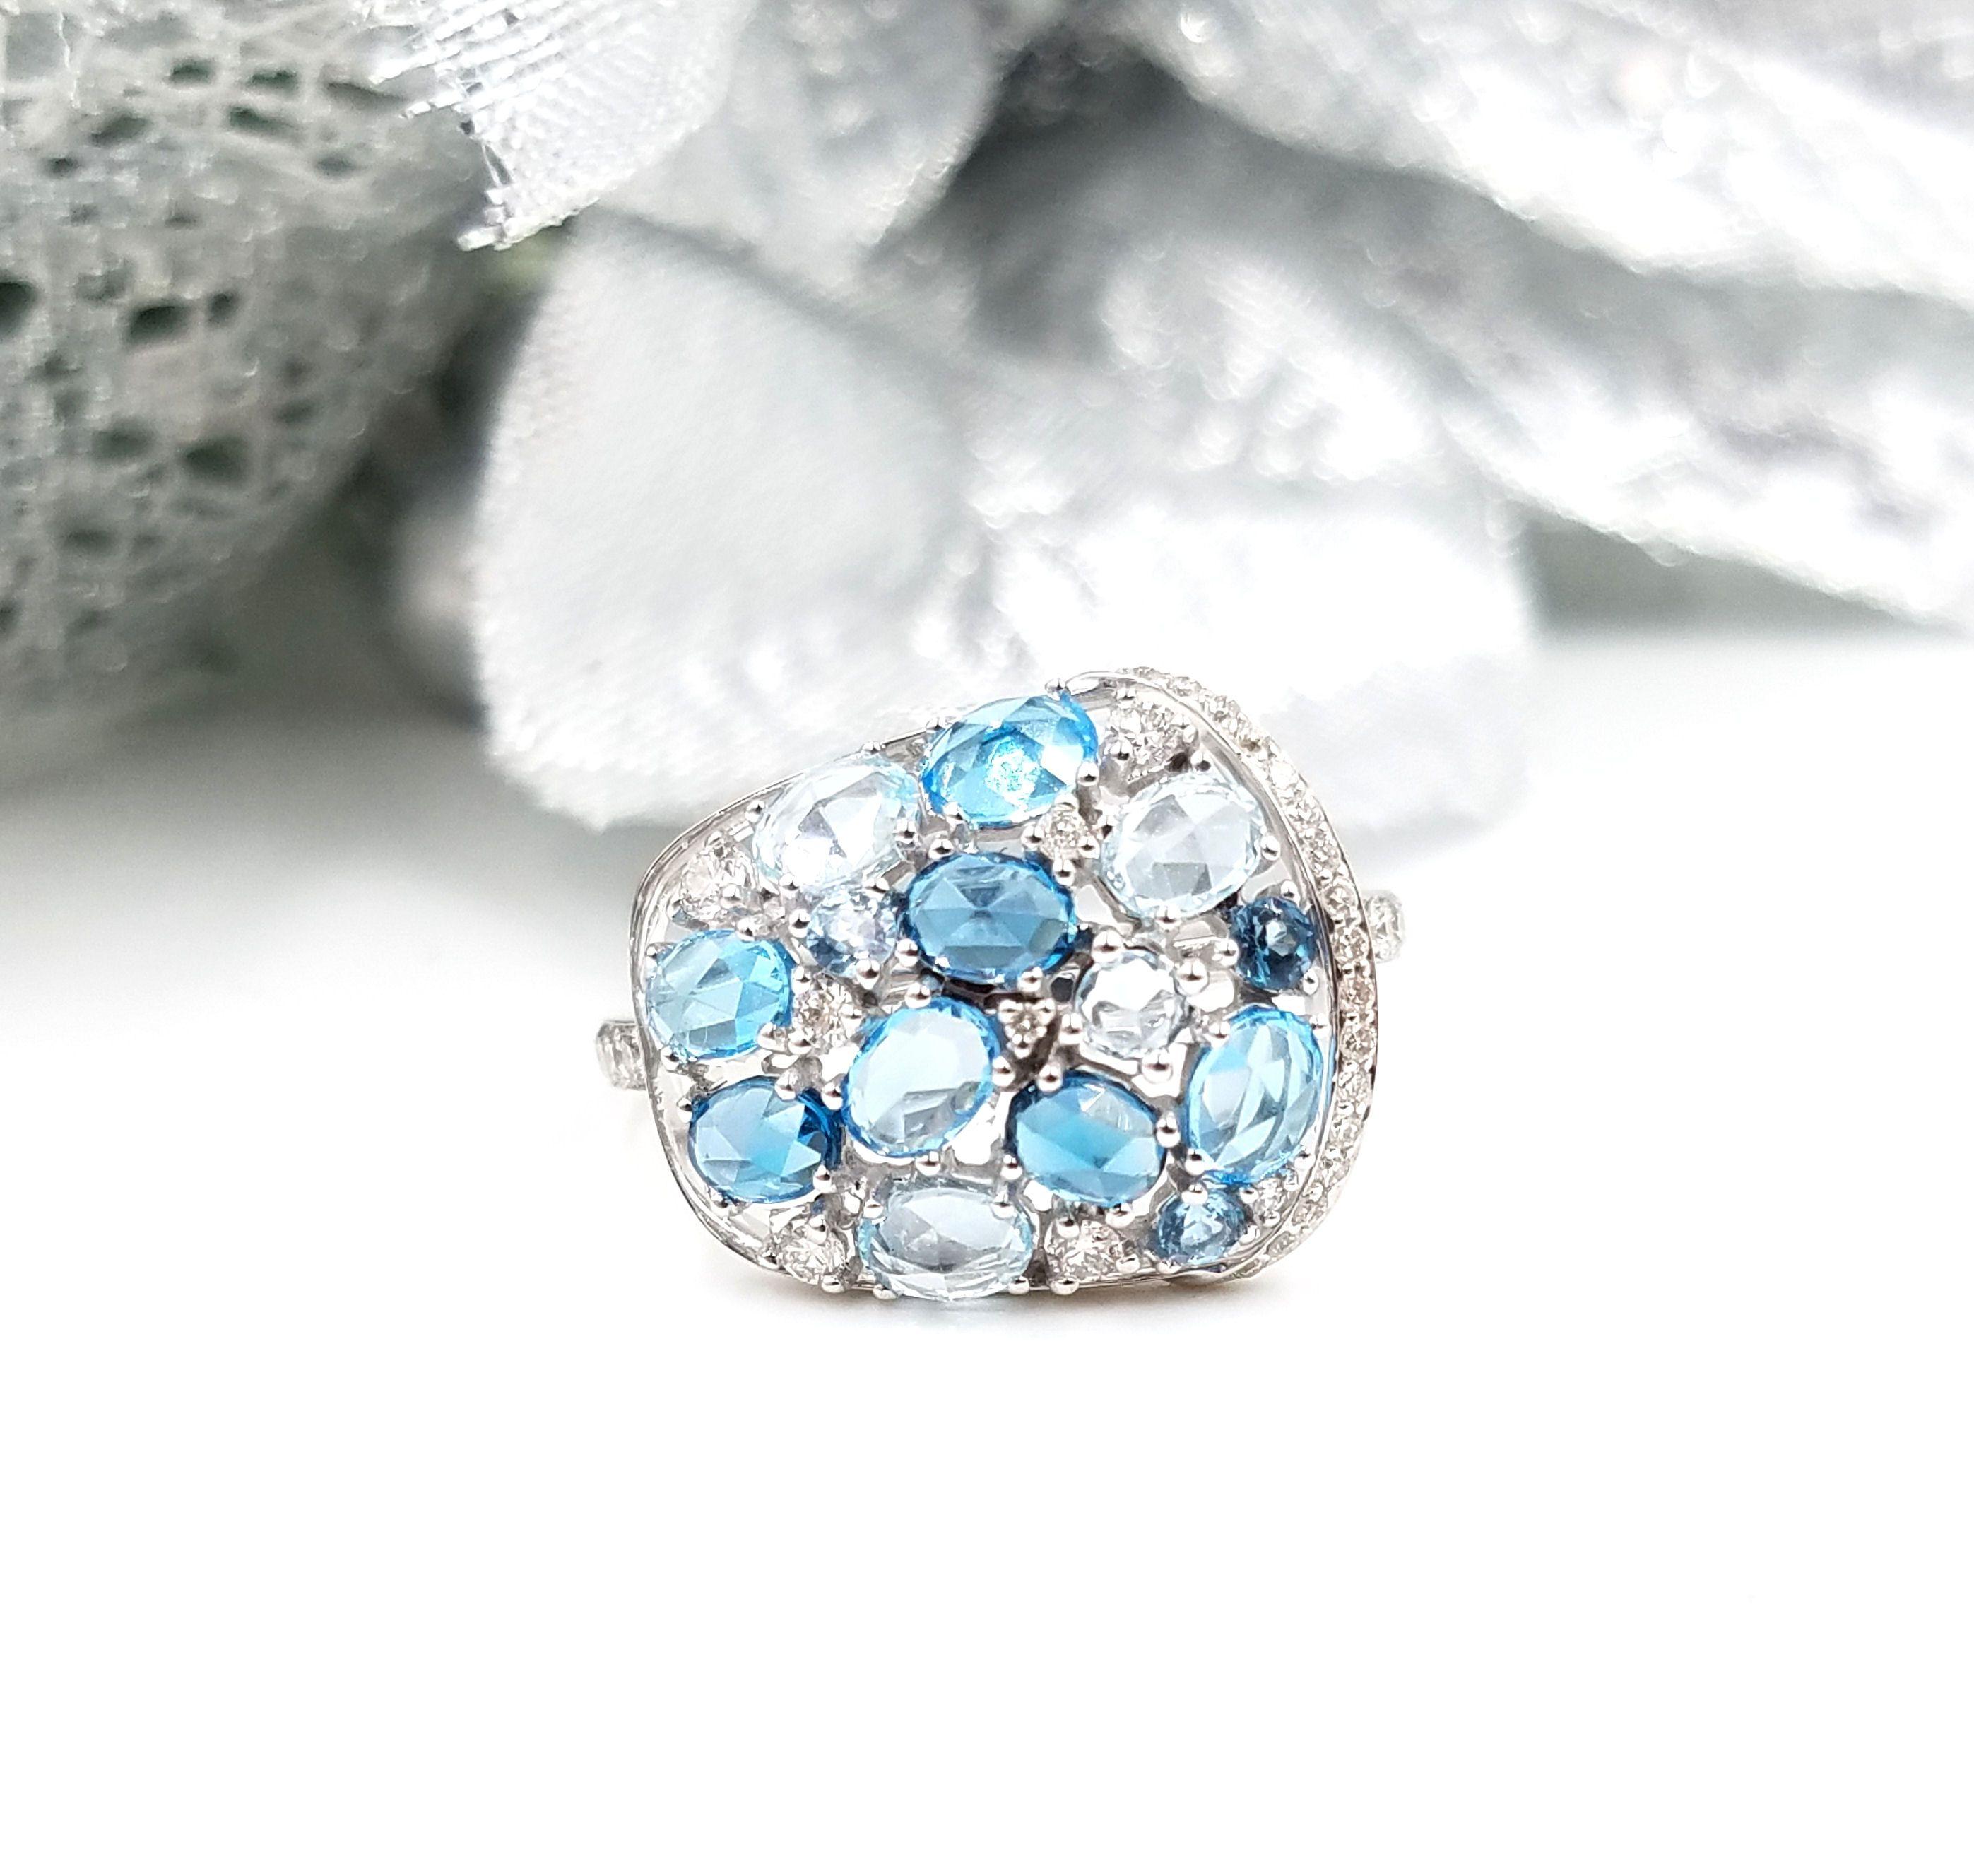 Beautiful blue topaz sky blu topaz and london blue topaz ring with